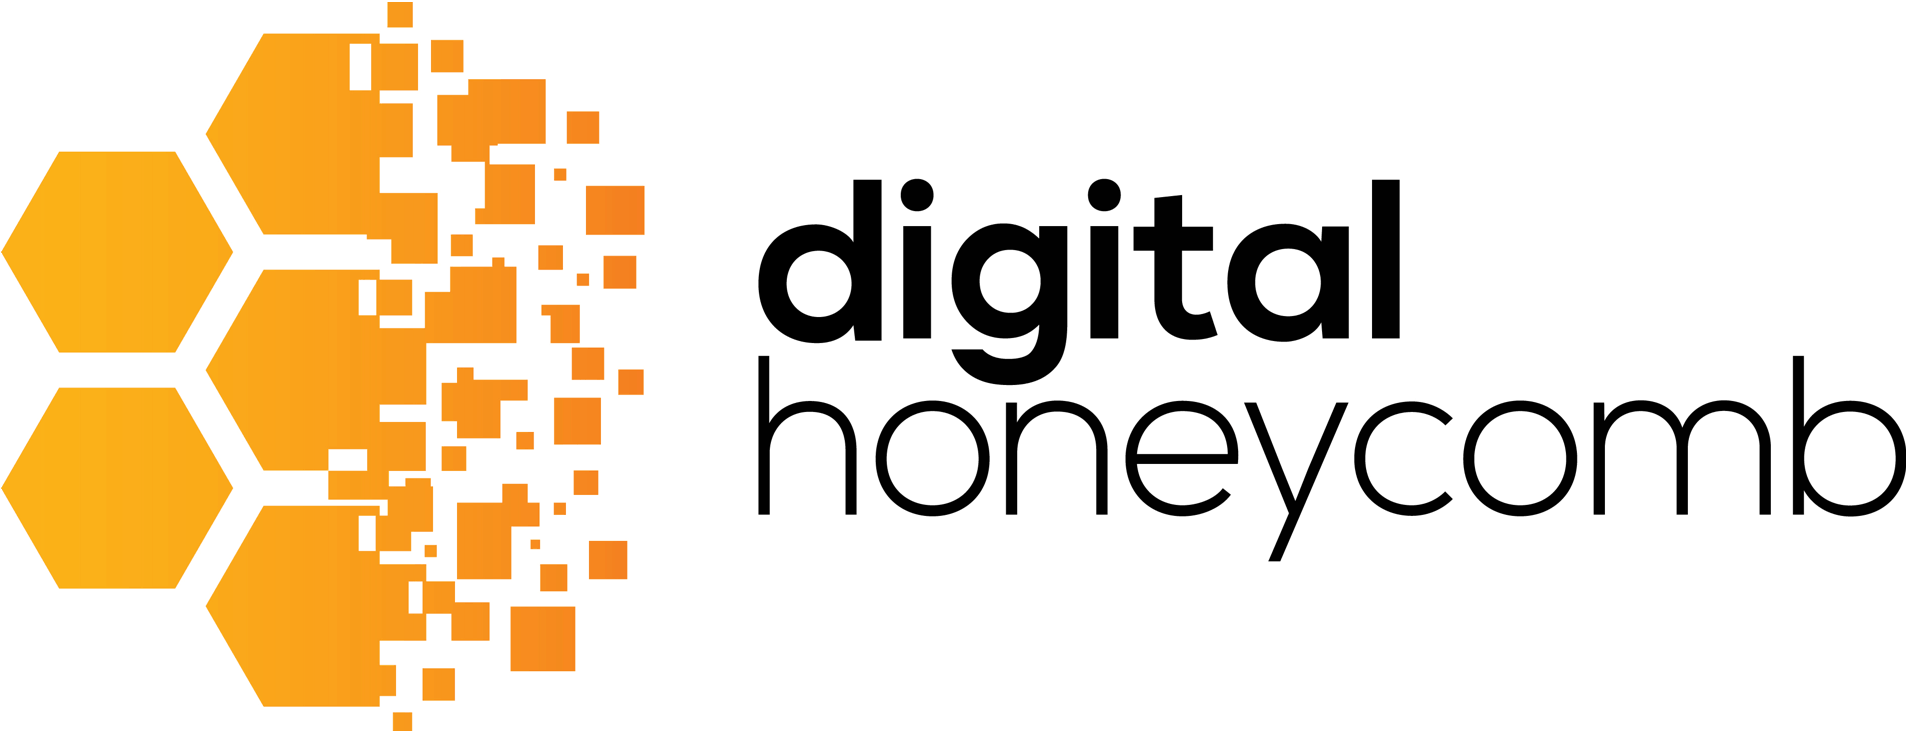 Digitalhoneycomb